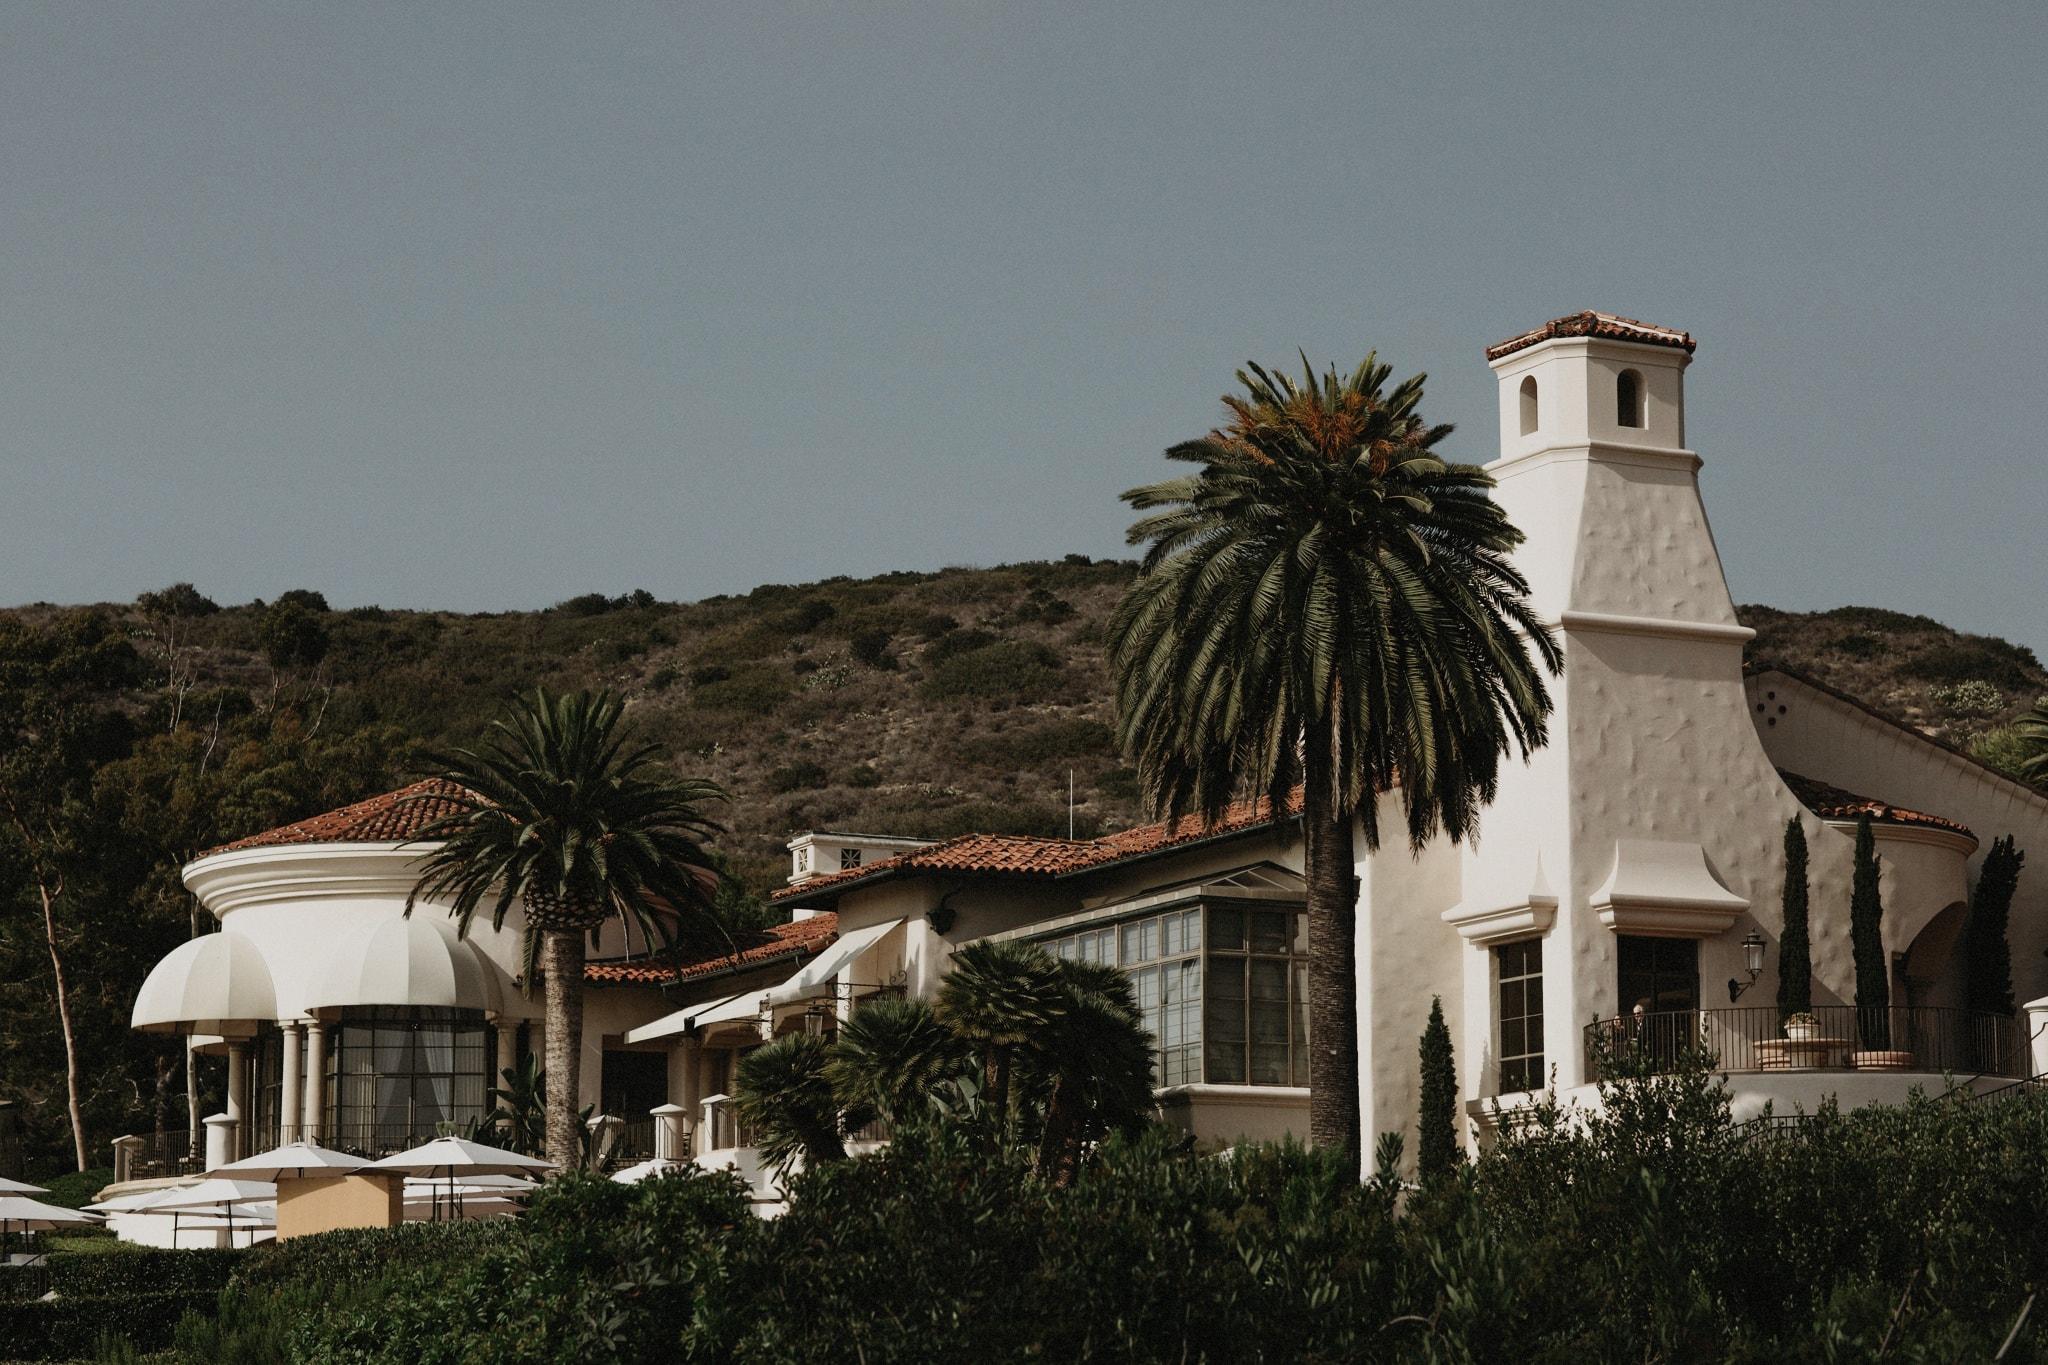 016-the-resort-at-pelican-hill.jpg